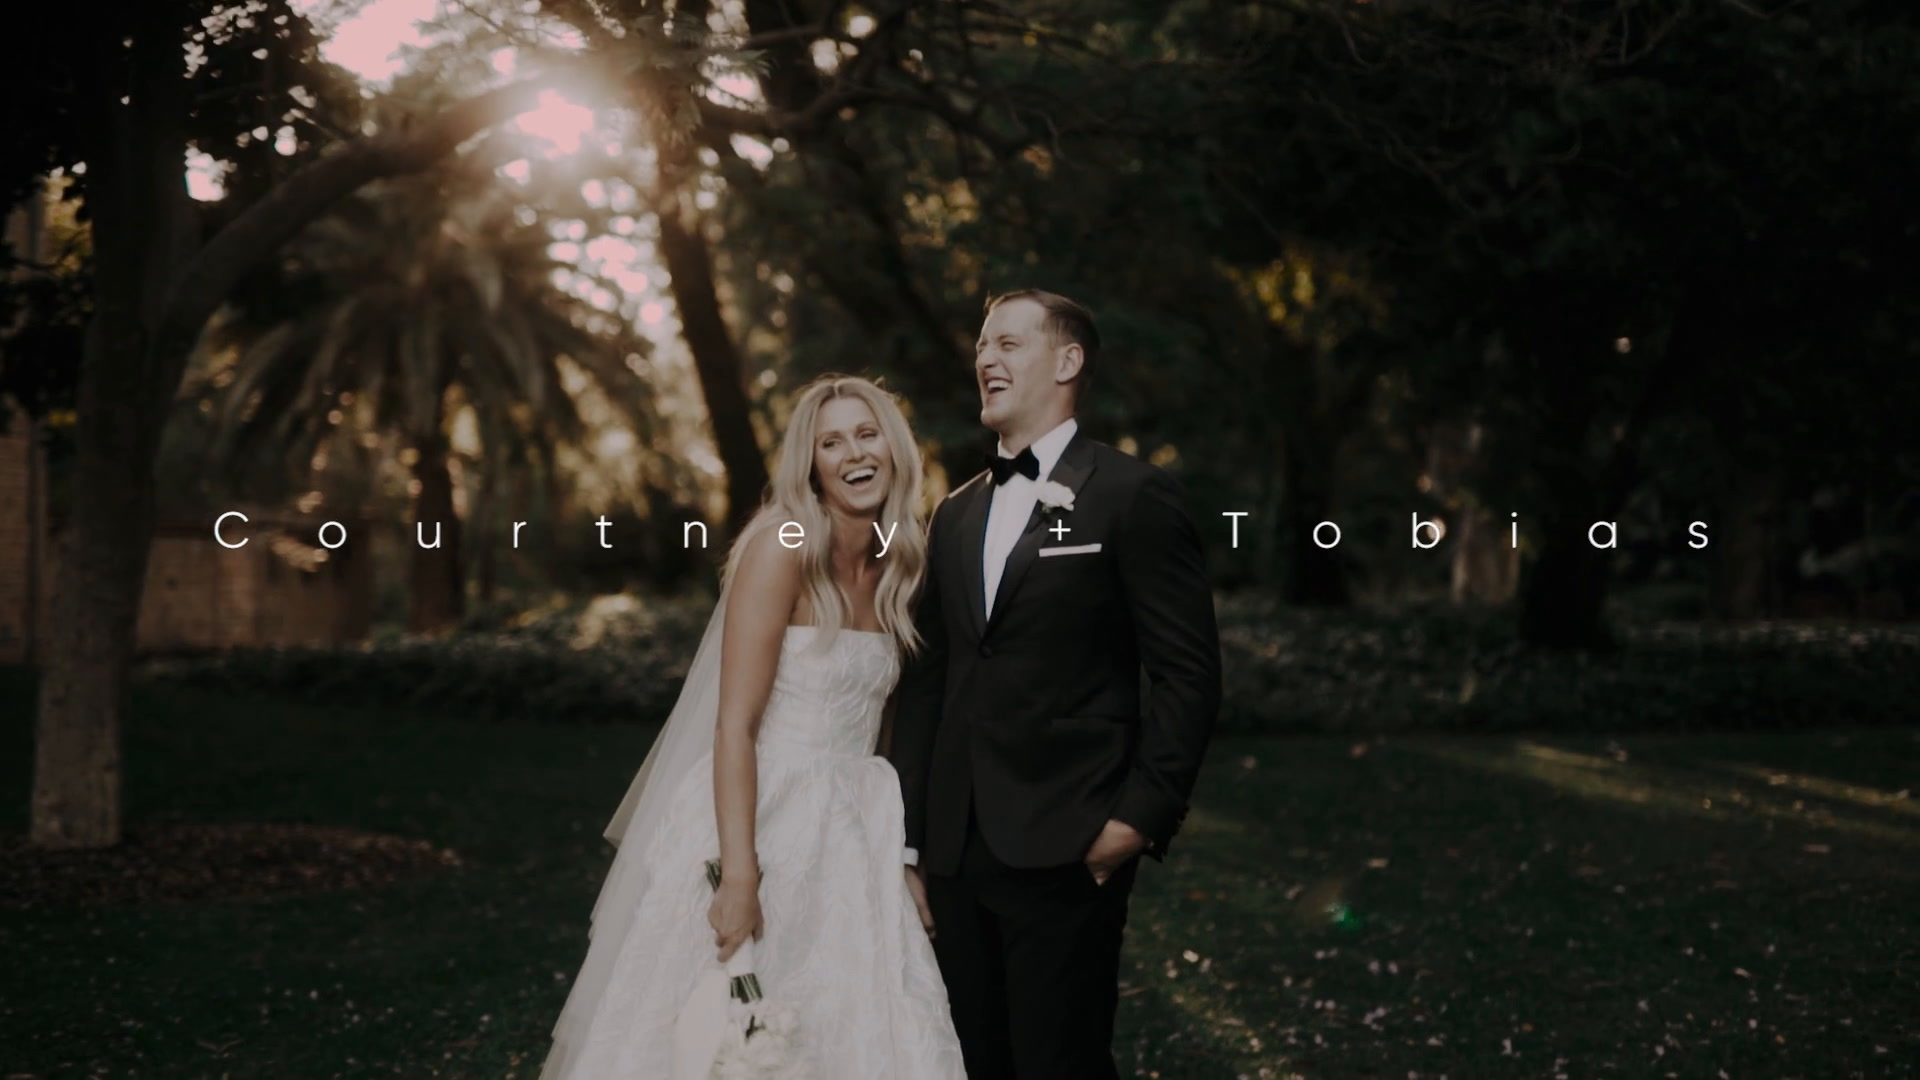 Courtney + Tobias | Perth, Australia | Matilda Bay